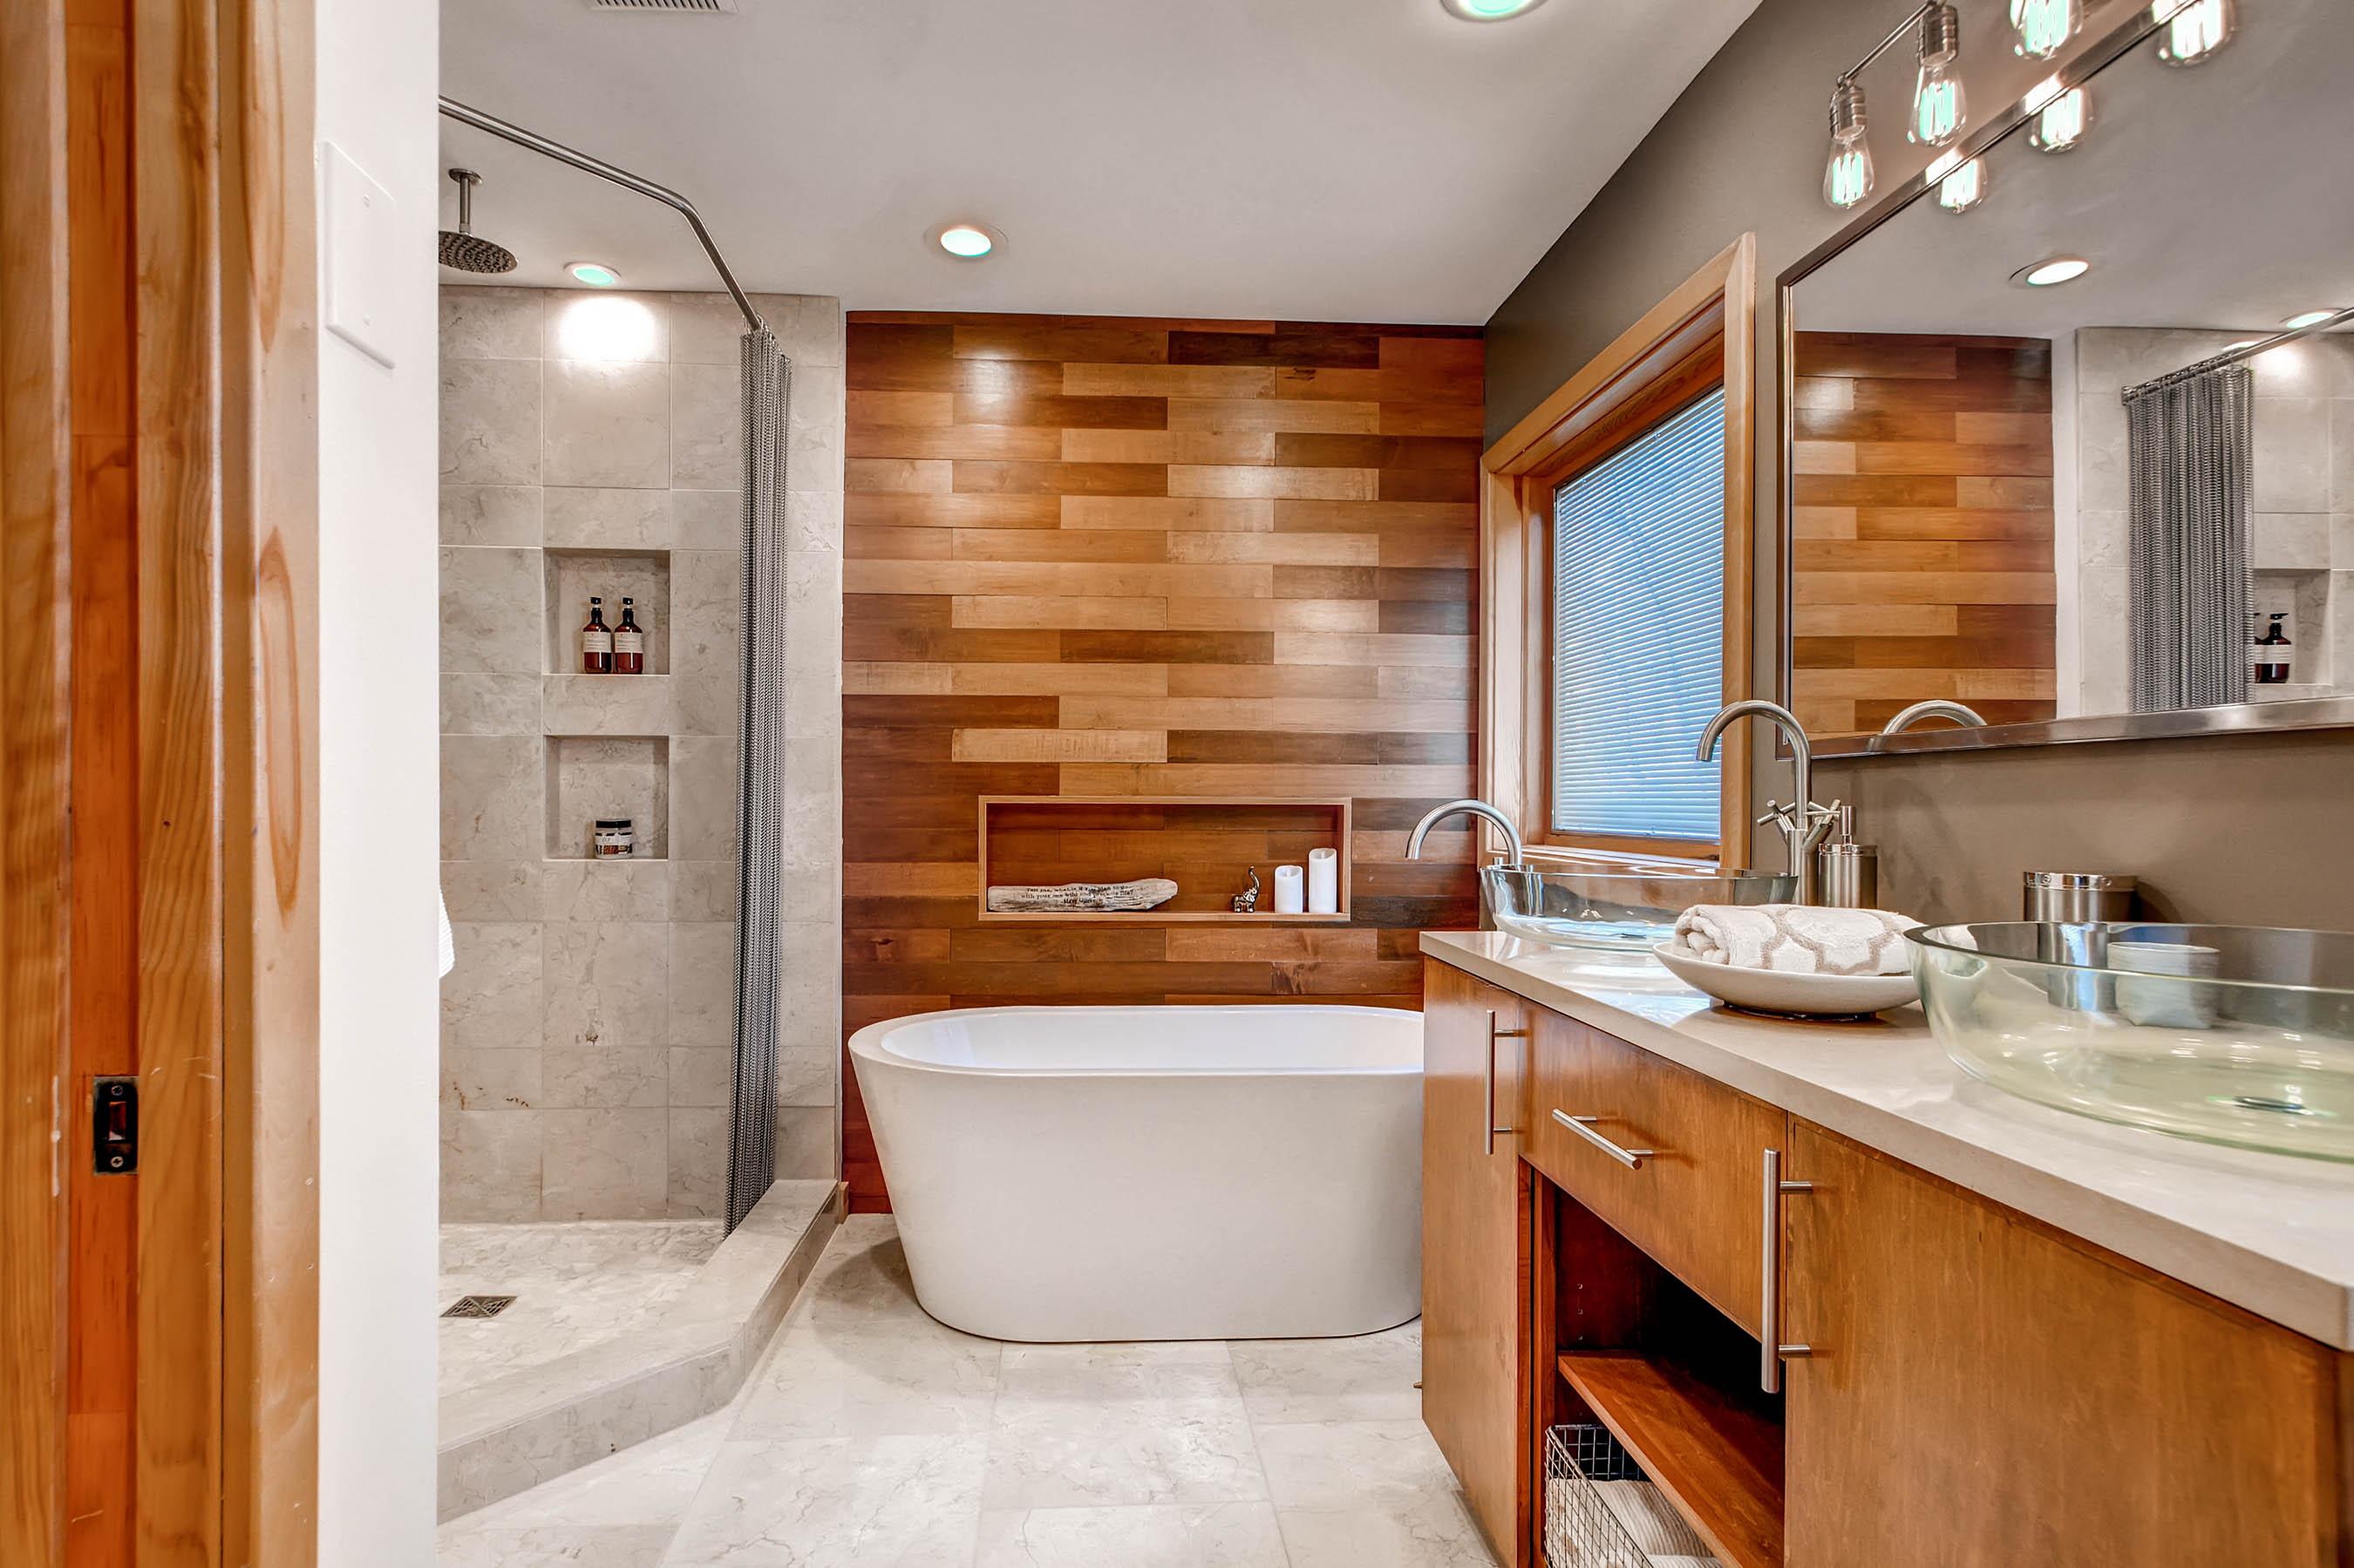 Spa Like Master Bathroom Remodel